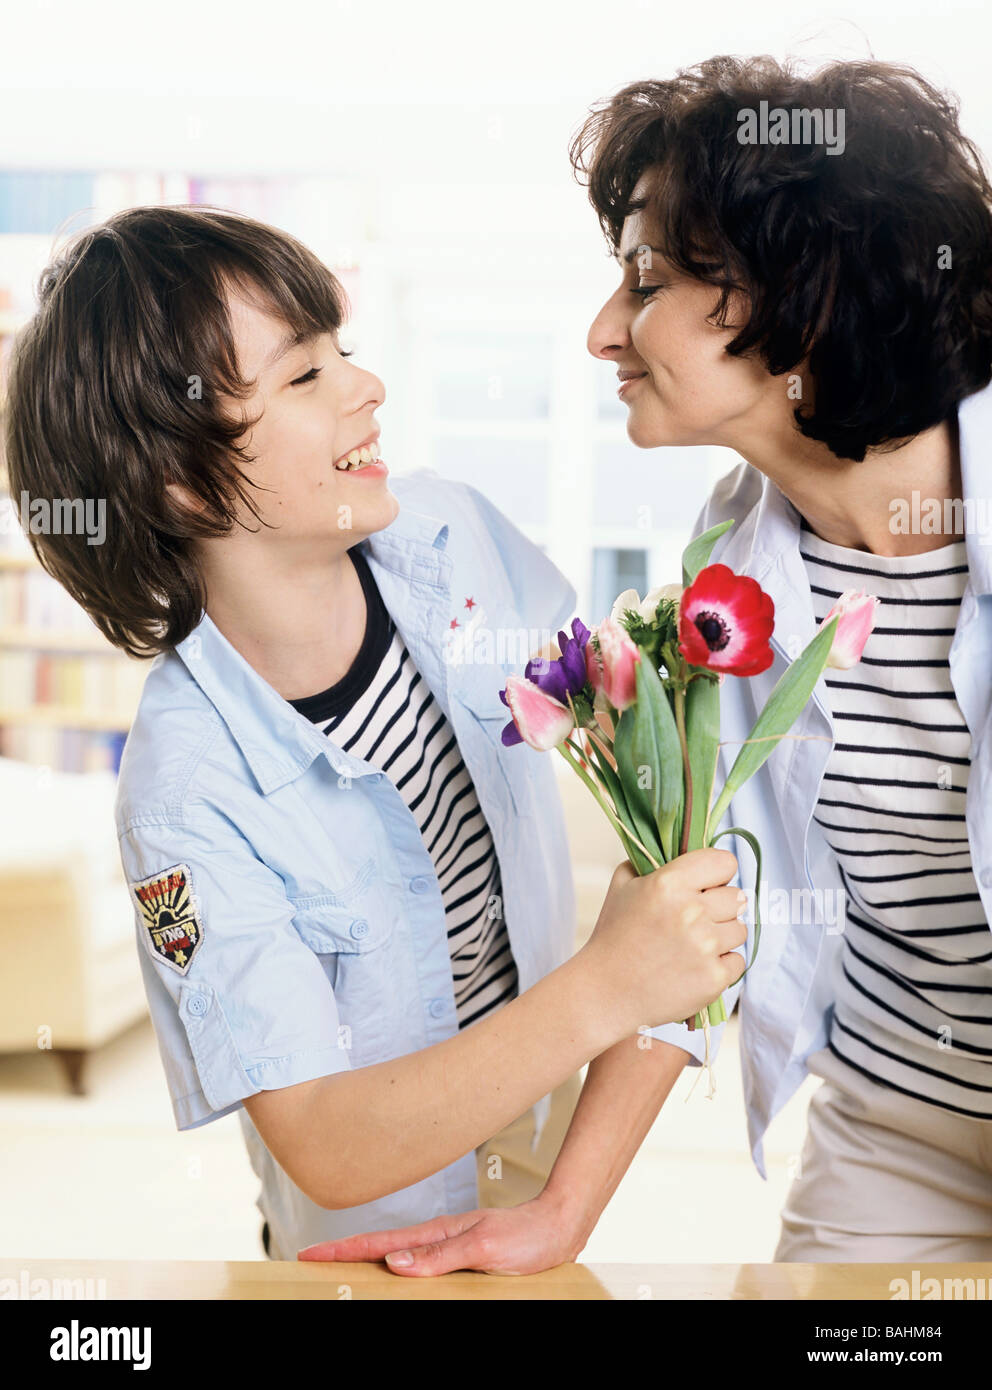 people, boy, teenager, 10-15, 15-20, son, dark, haired, woman, 40-45, 45-50, mother, smile, smiling, same, similar, - Stock Image